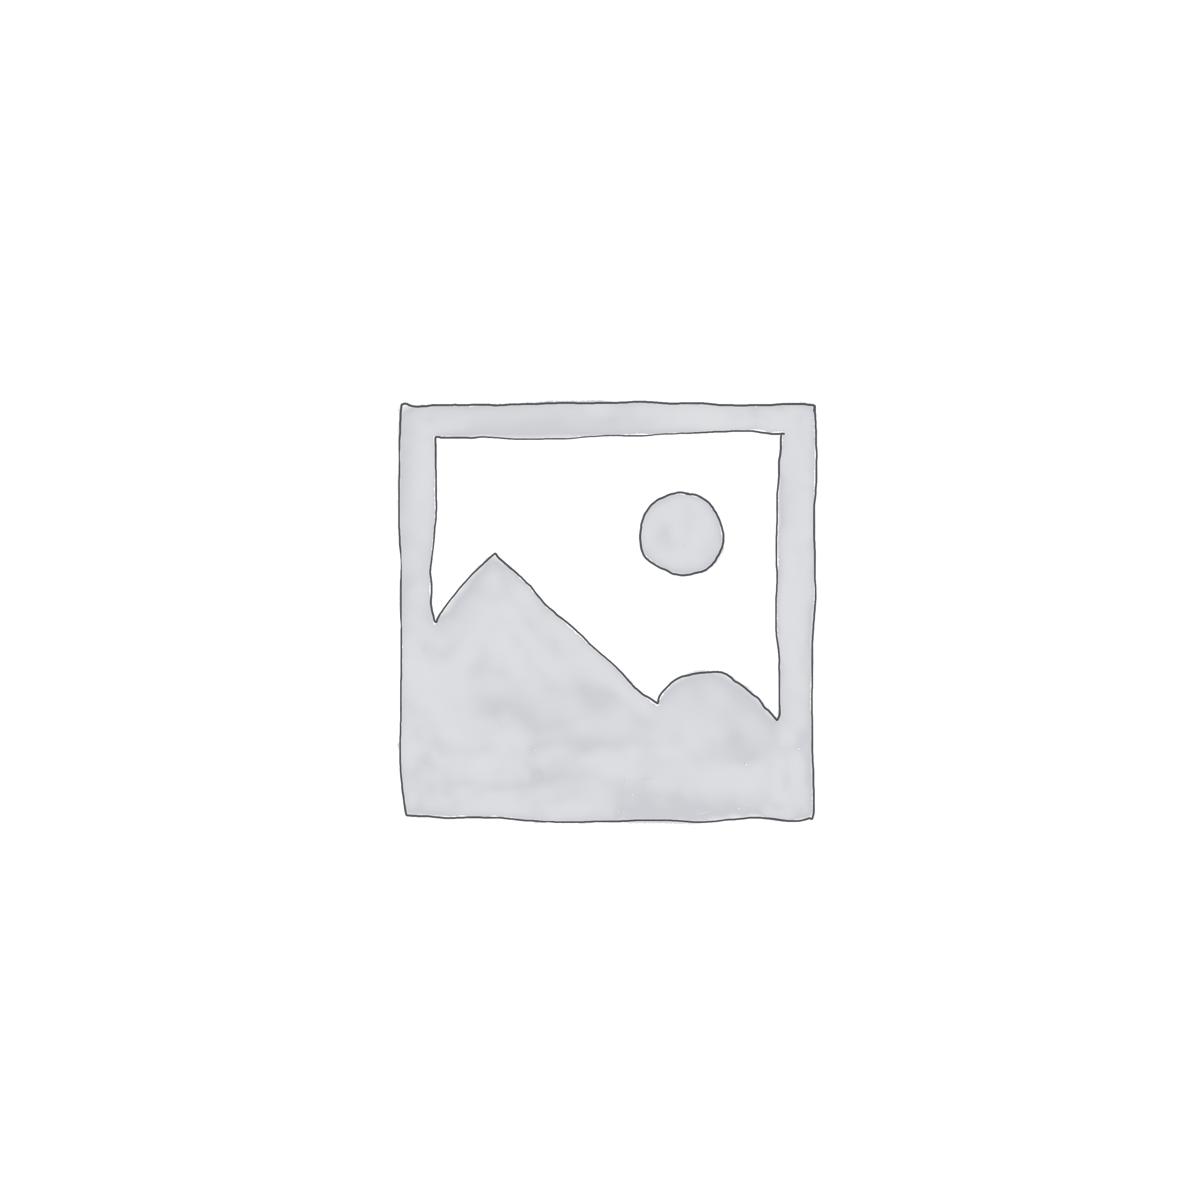 Vintage Train Wagon Railway Wallpaper Mural